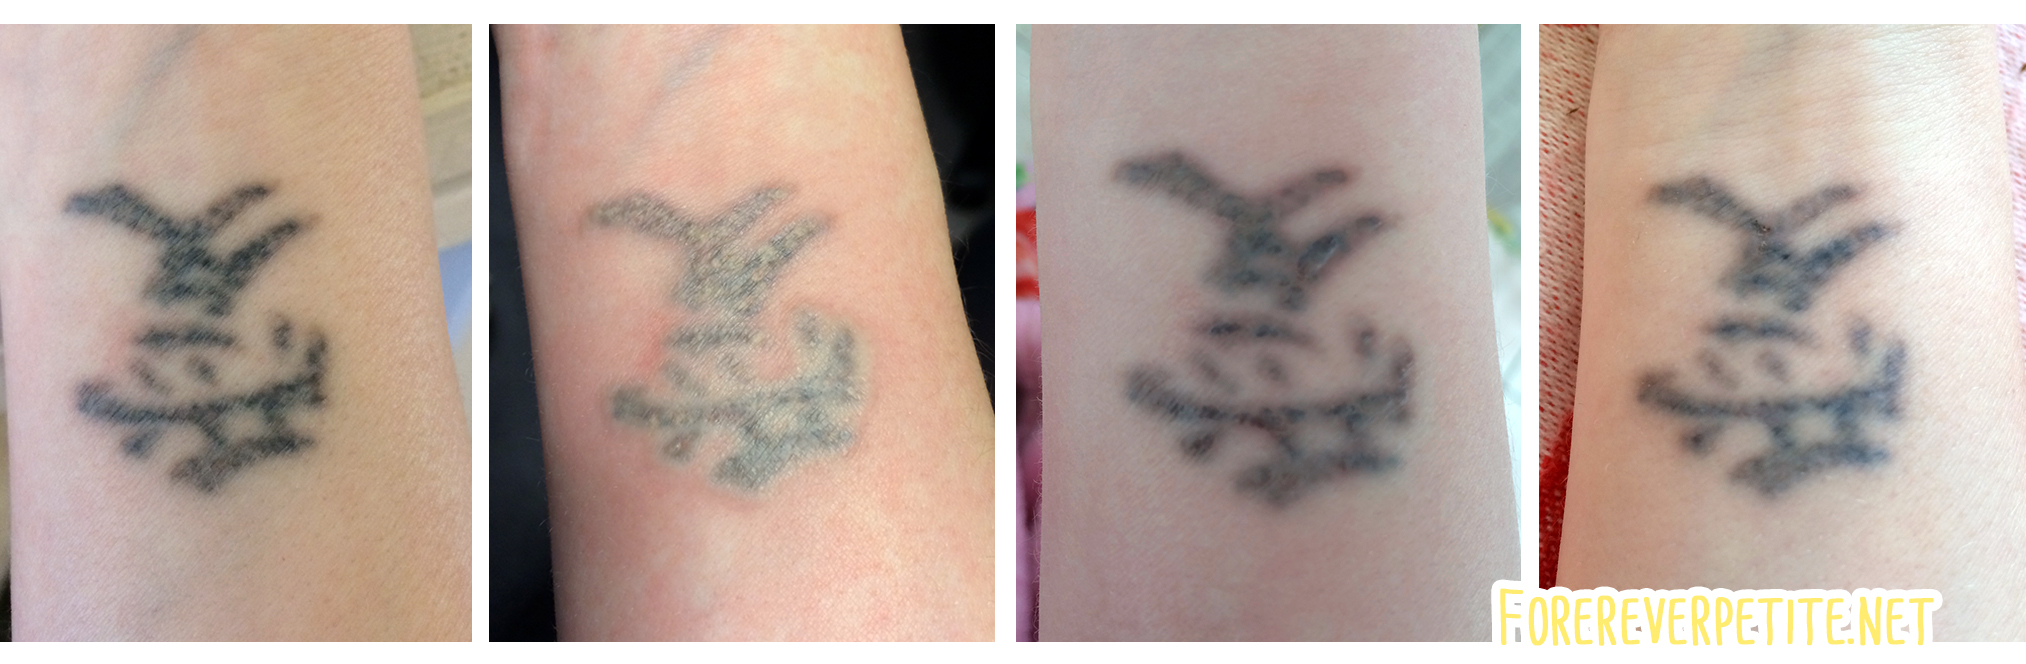 Tattoo Verwijderen Sessie 4 Foreverpetite